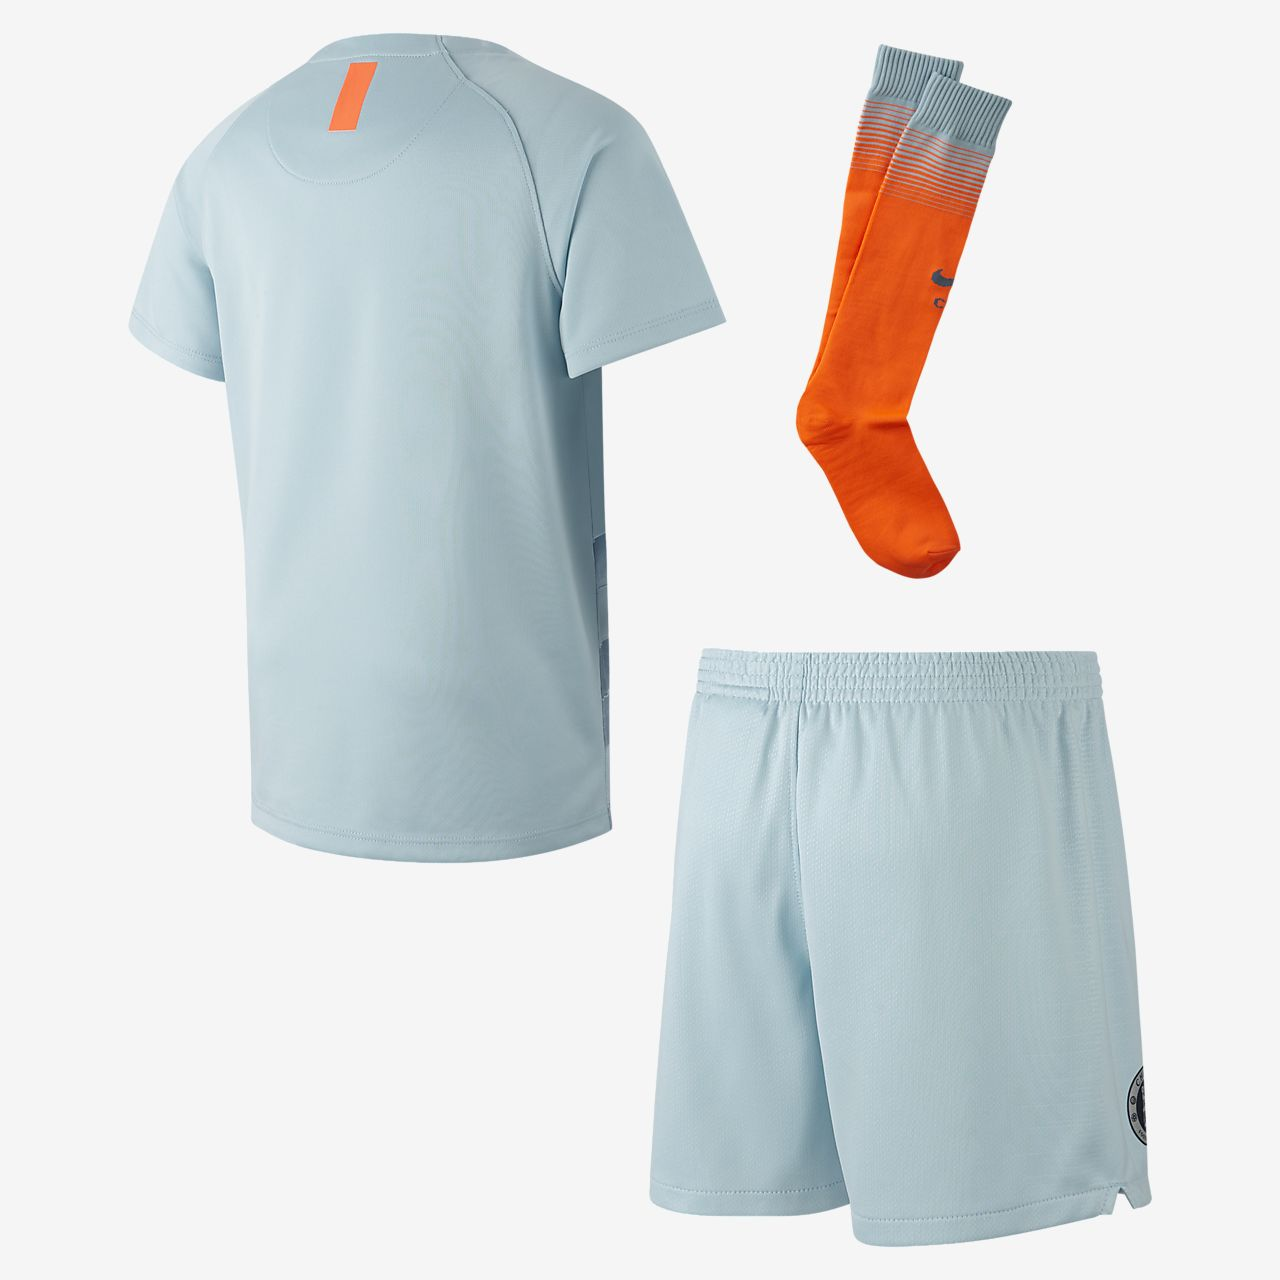 6ebb156397d 2018 Chelsea FC Stadium Away Third Younger Kids' Football Kit. Nike ...